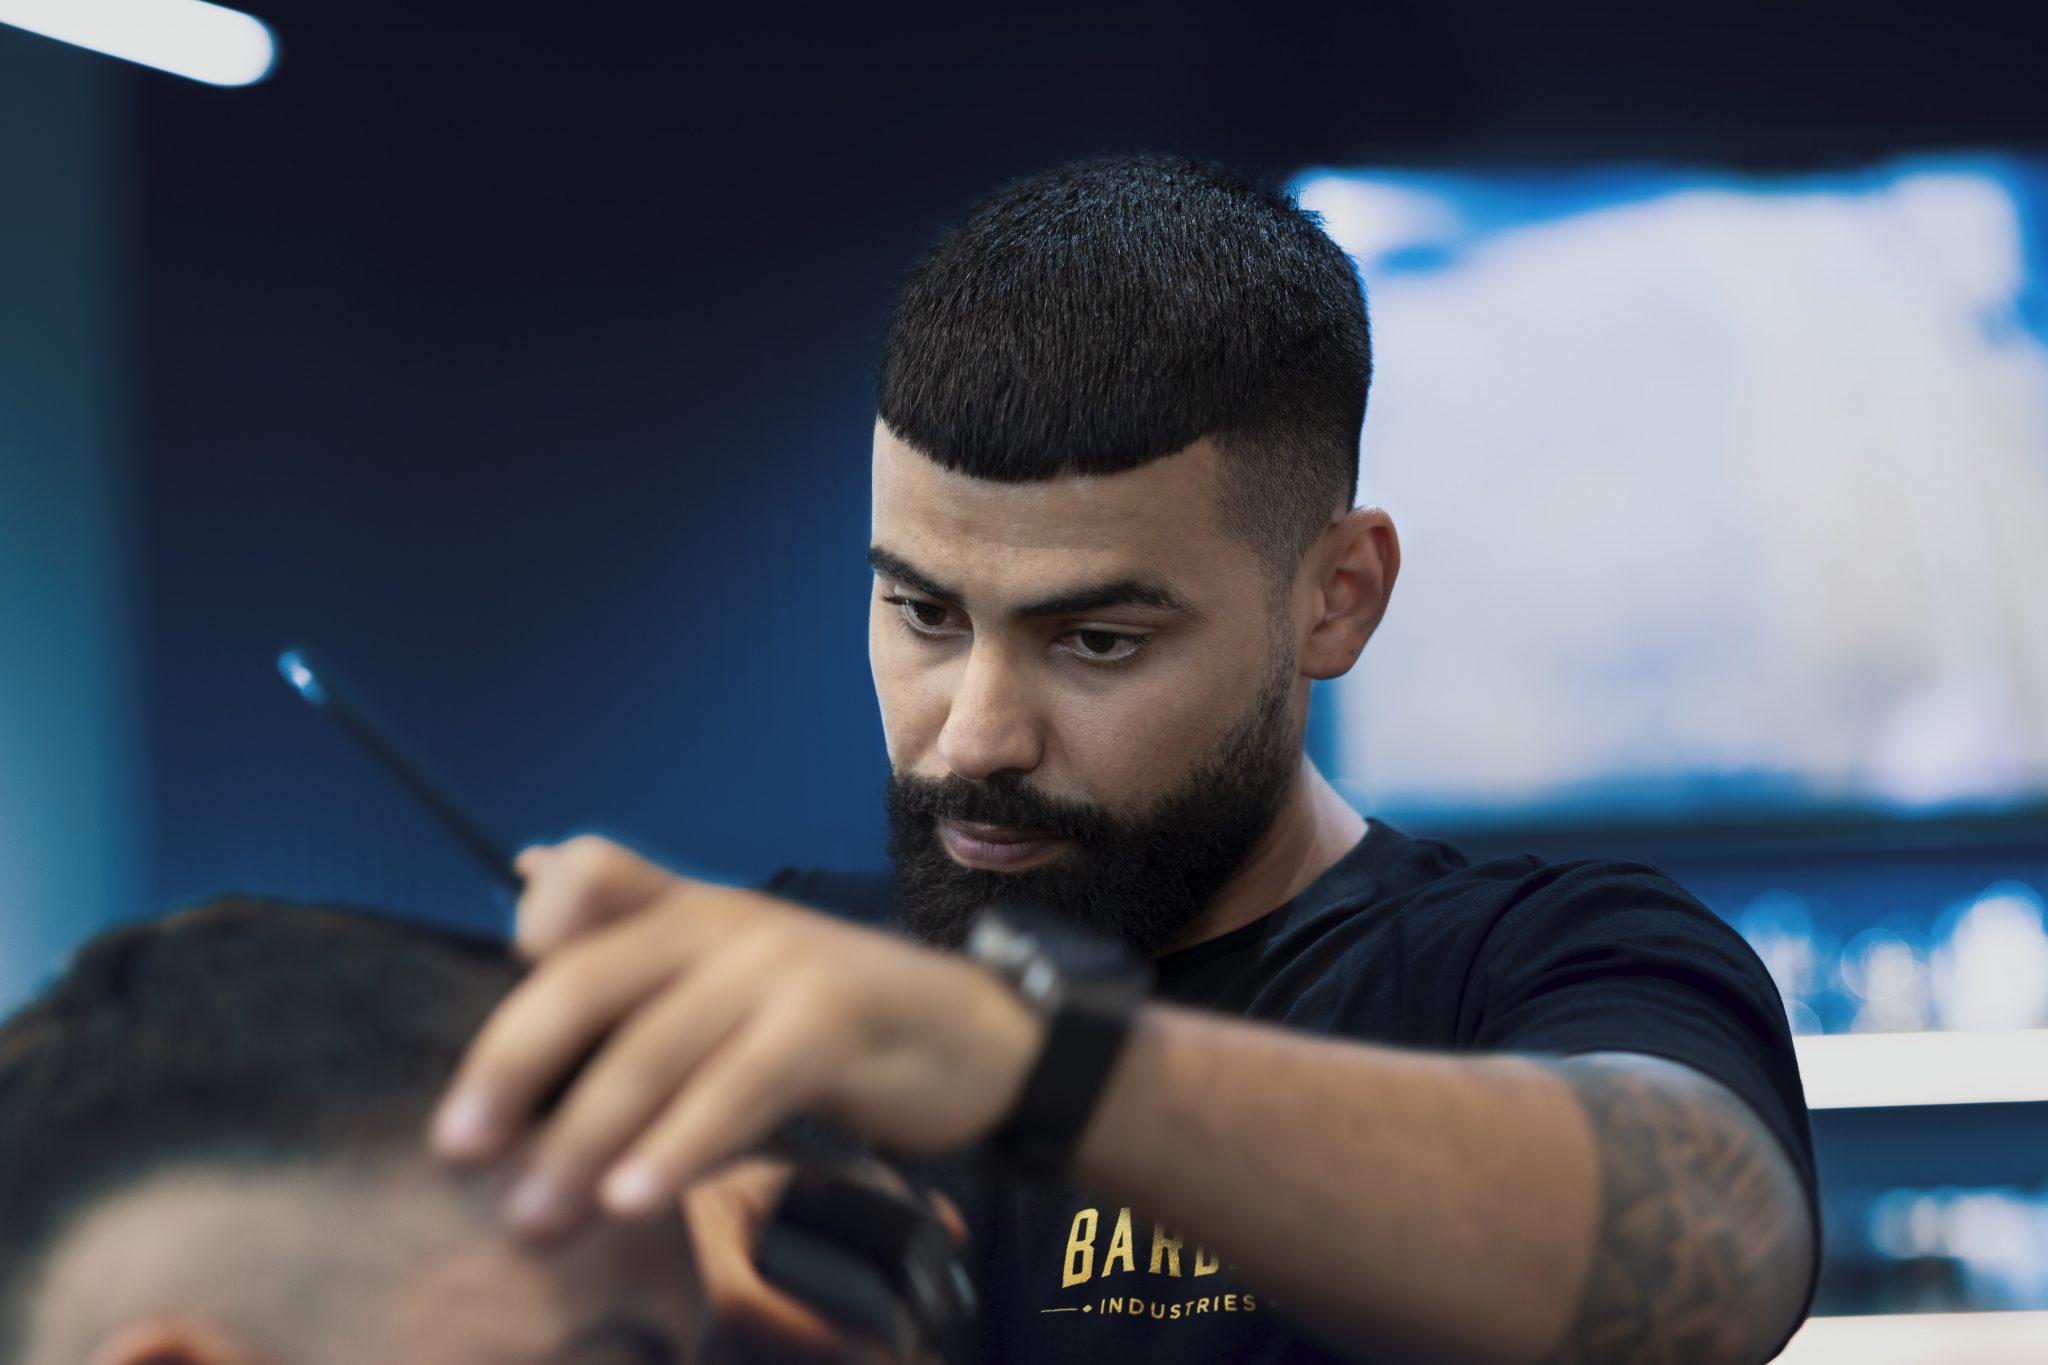 Barber Industries Morisset